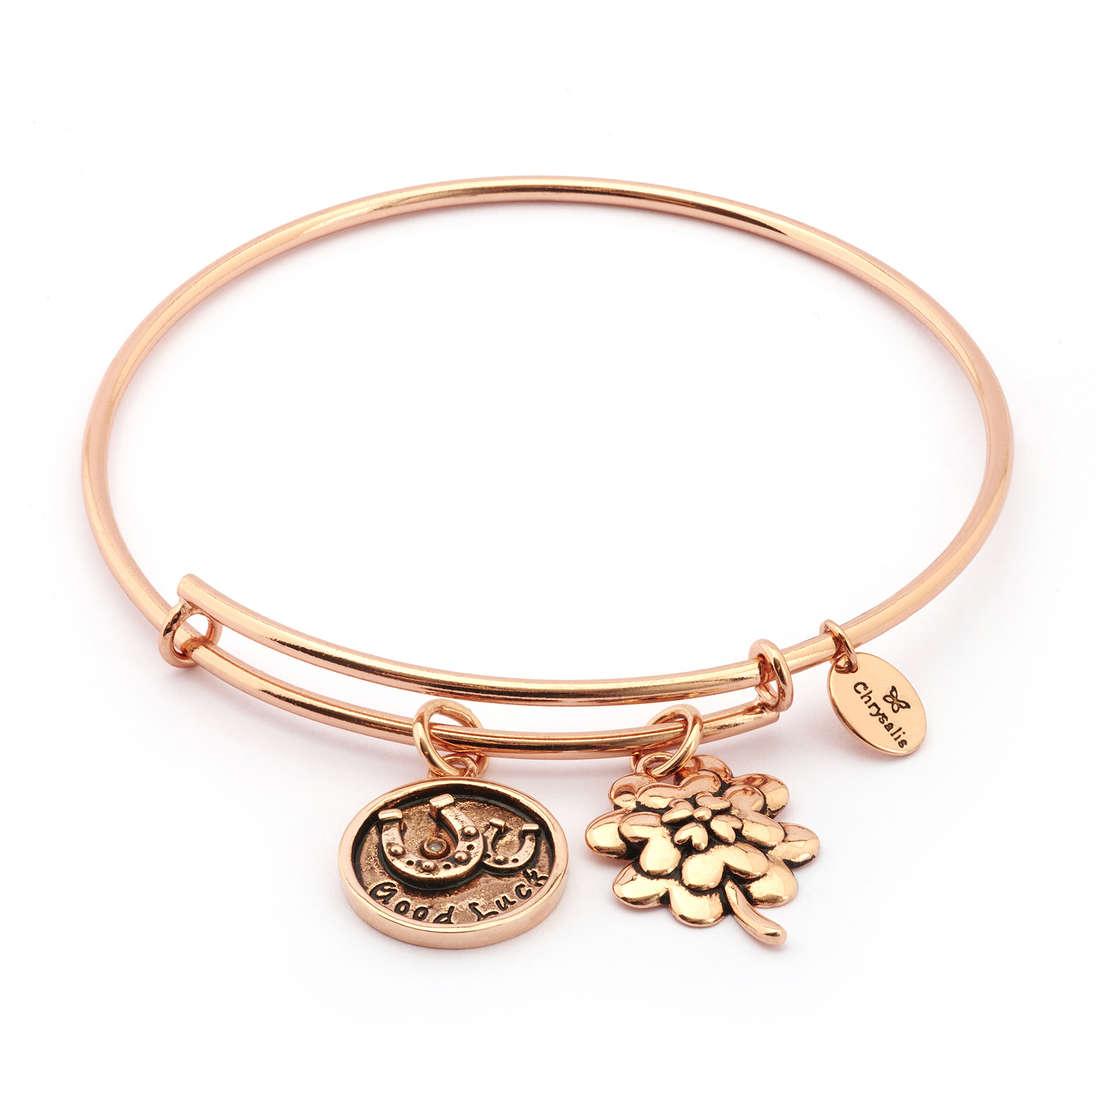 bracelet woman jewellery Chrysalis CRBT0722RG